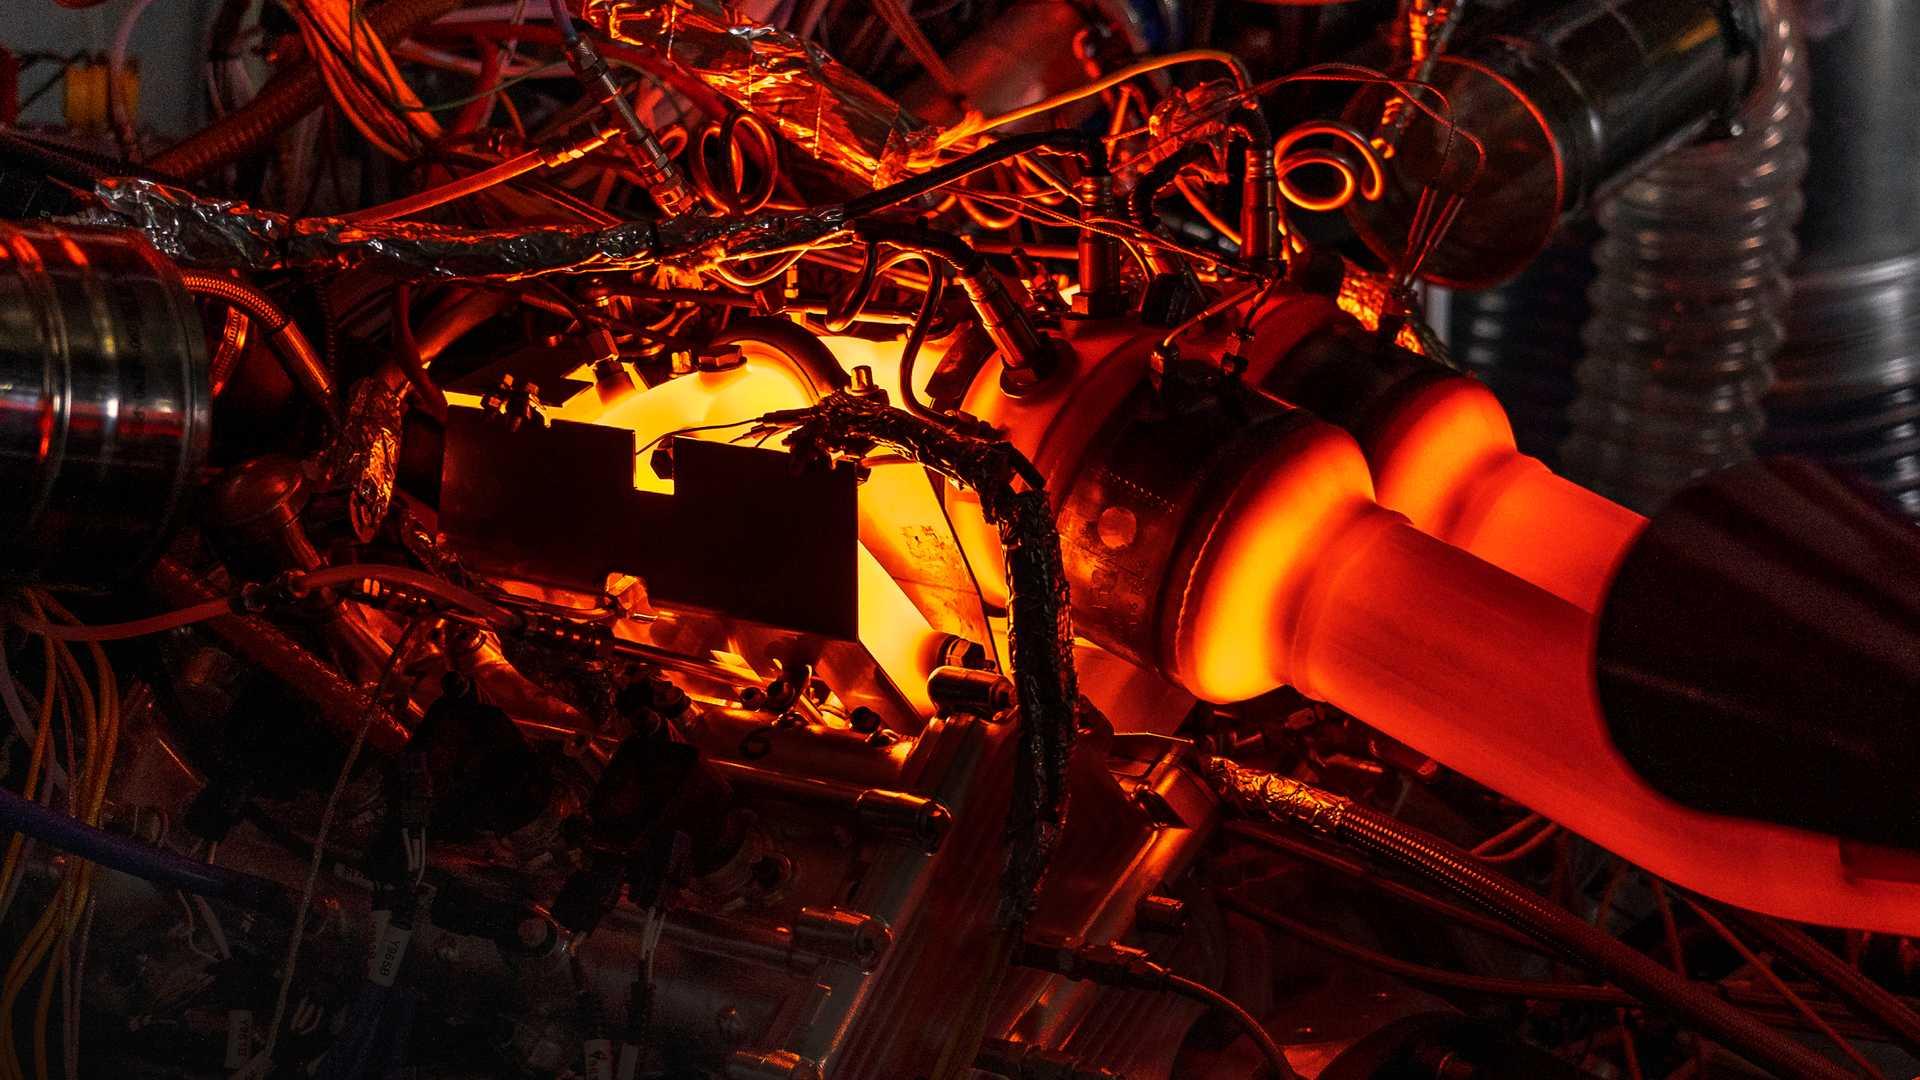 aston-martin-valhalla-tm01-3.0-liter-turbocharged-v6.jpg